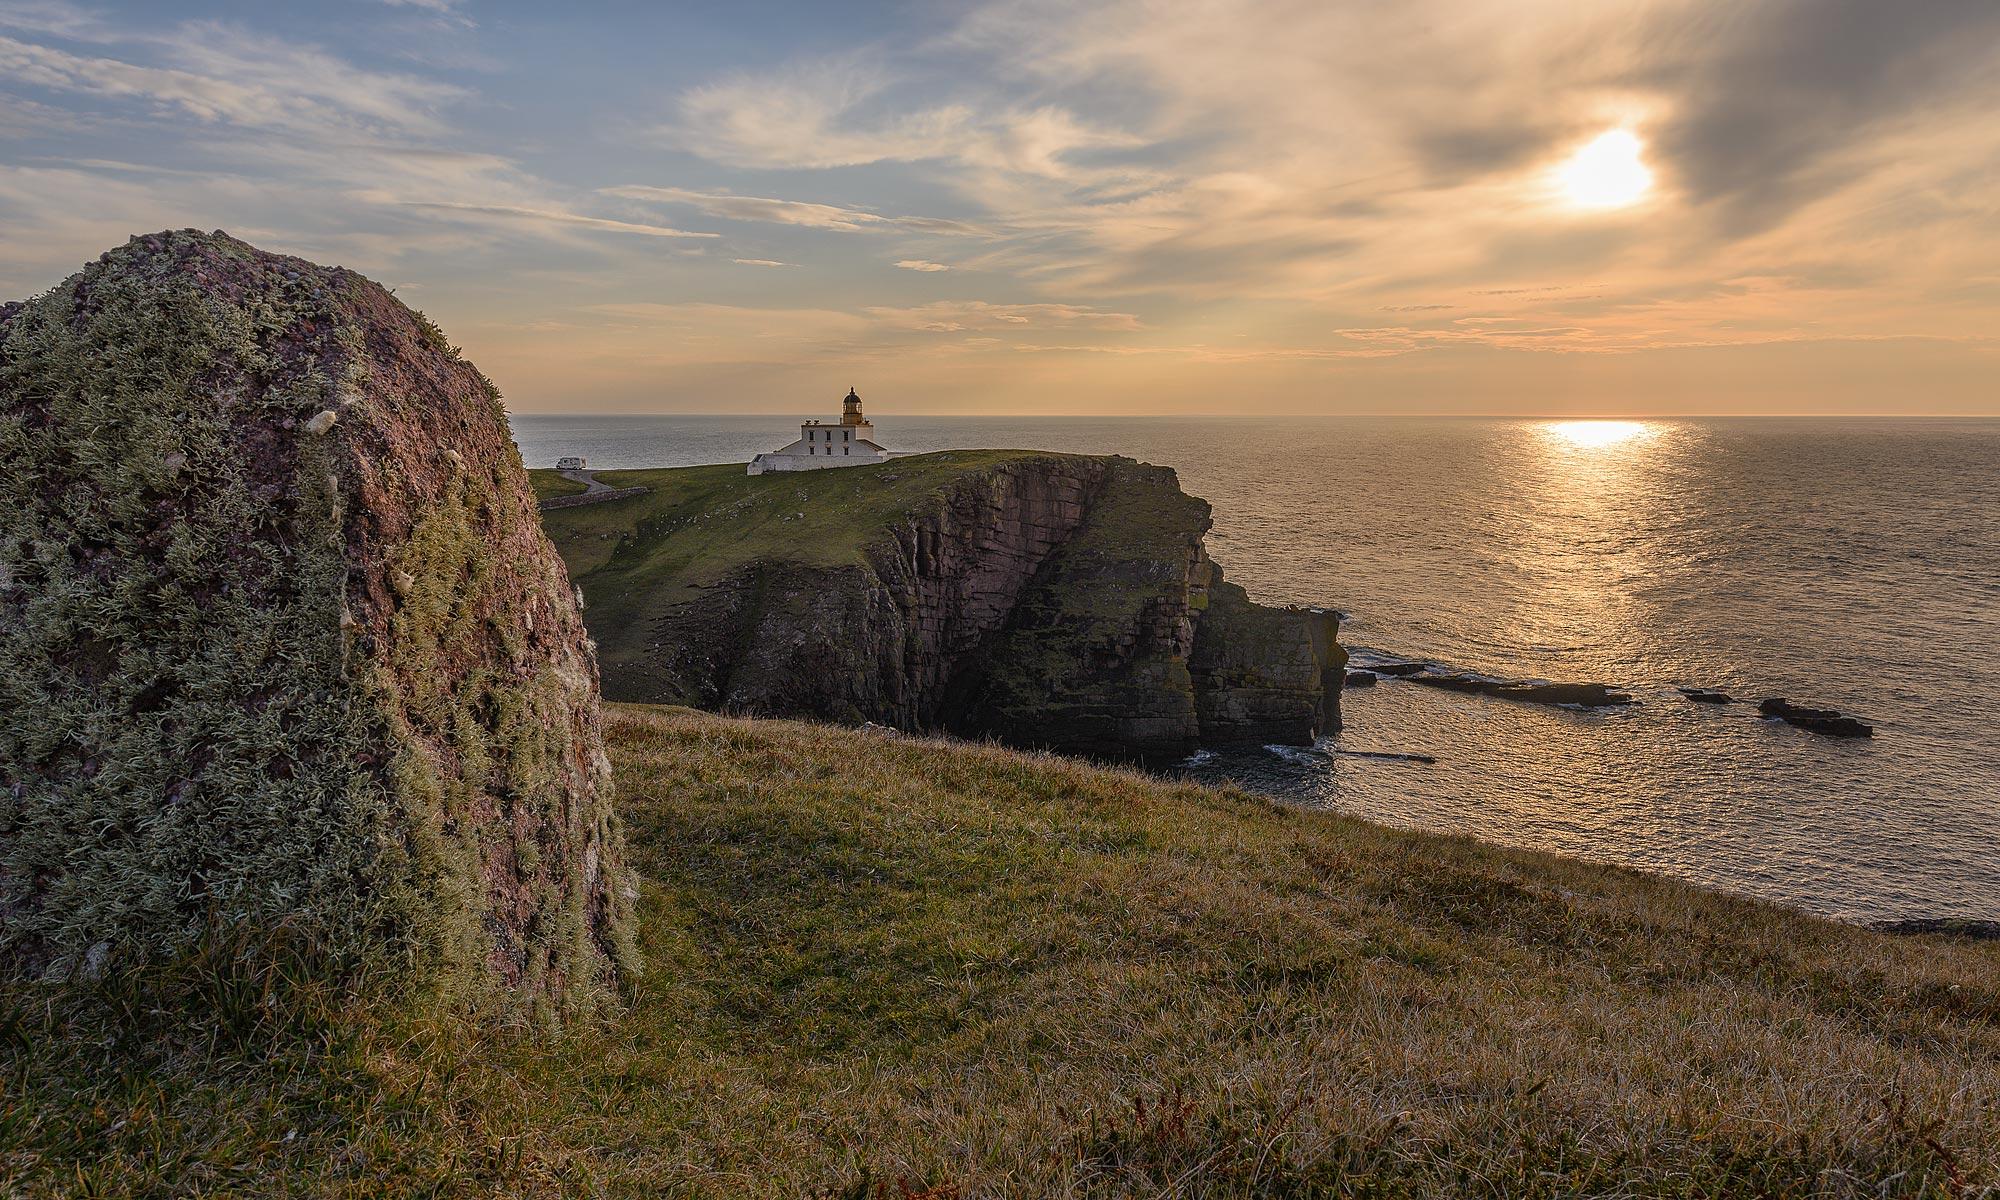 Stoer Head Lighthouse, Leuchtturm auf der Stoer-Halbinsel